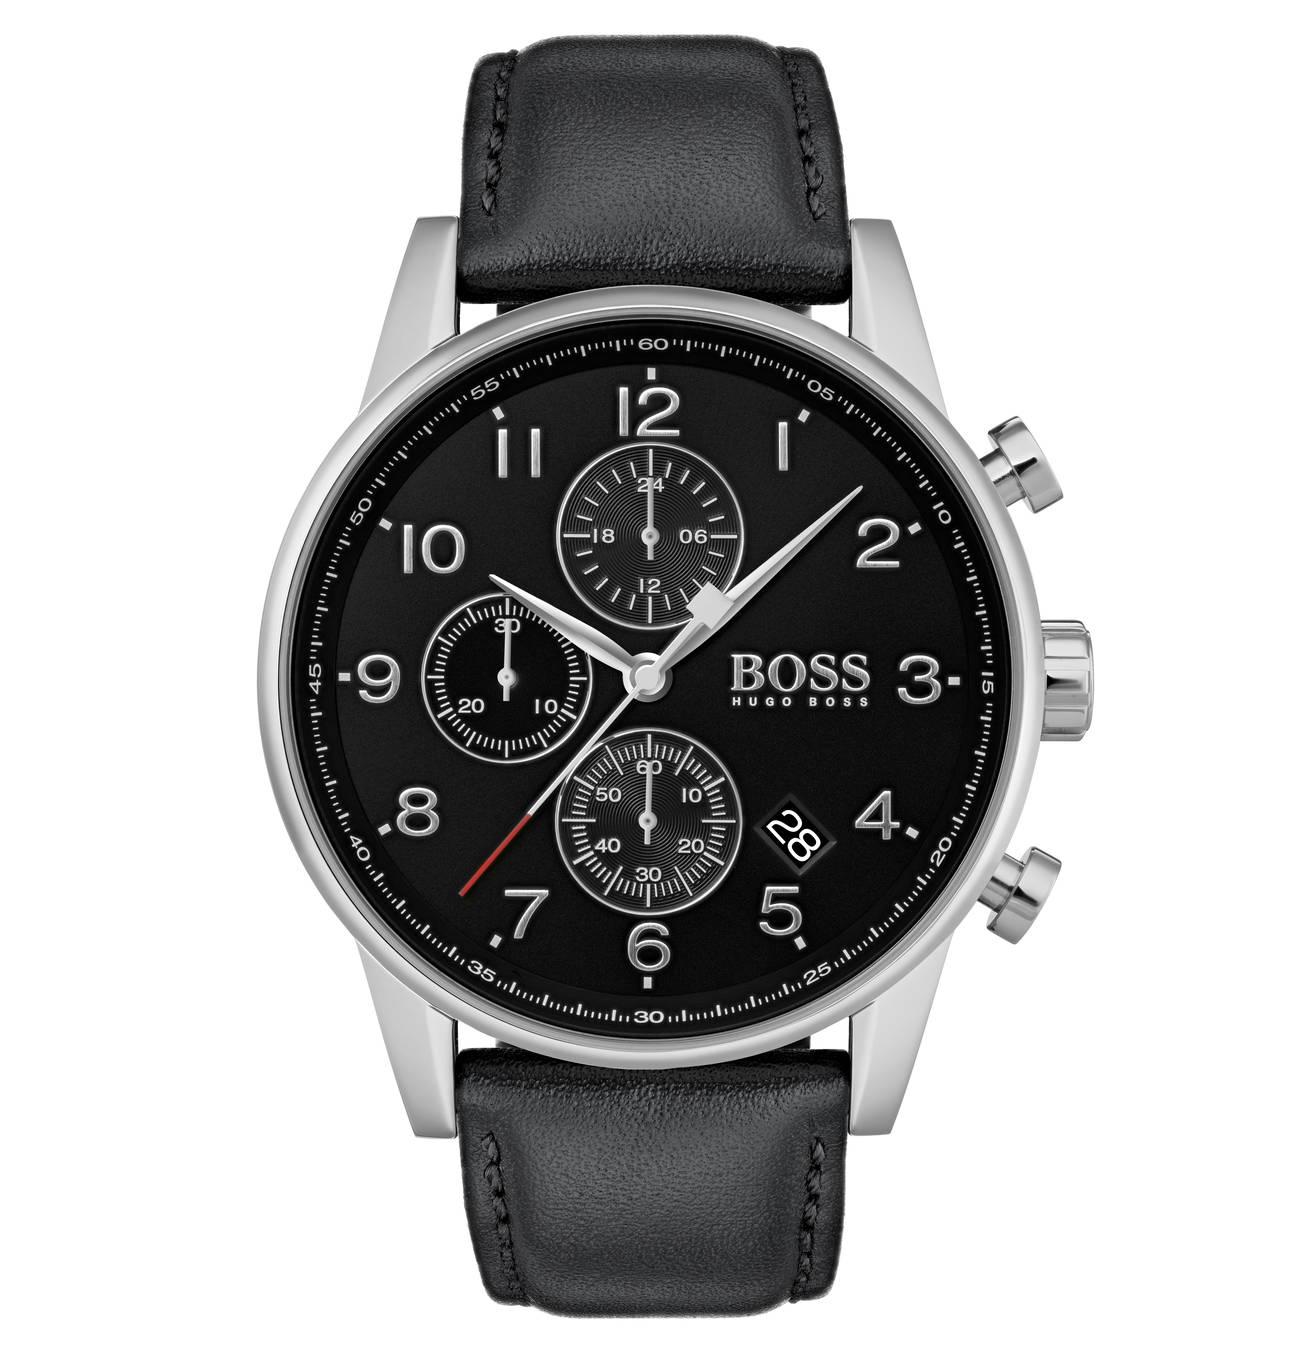 Herrenuhr Navigator 1513678 Chronograph Boss Uhren Herren Chronograph Und Uhren Herren